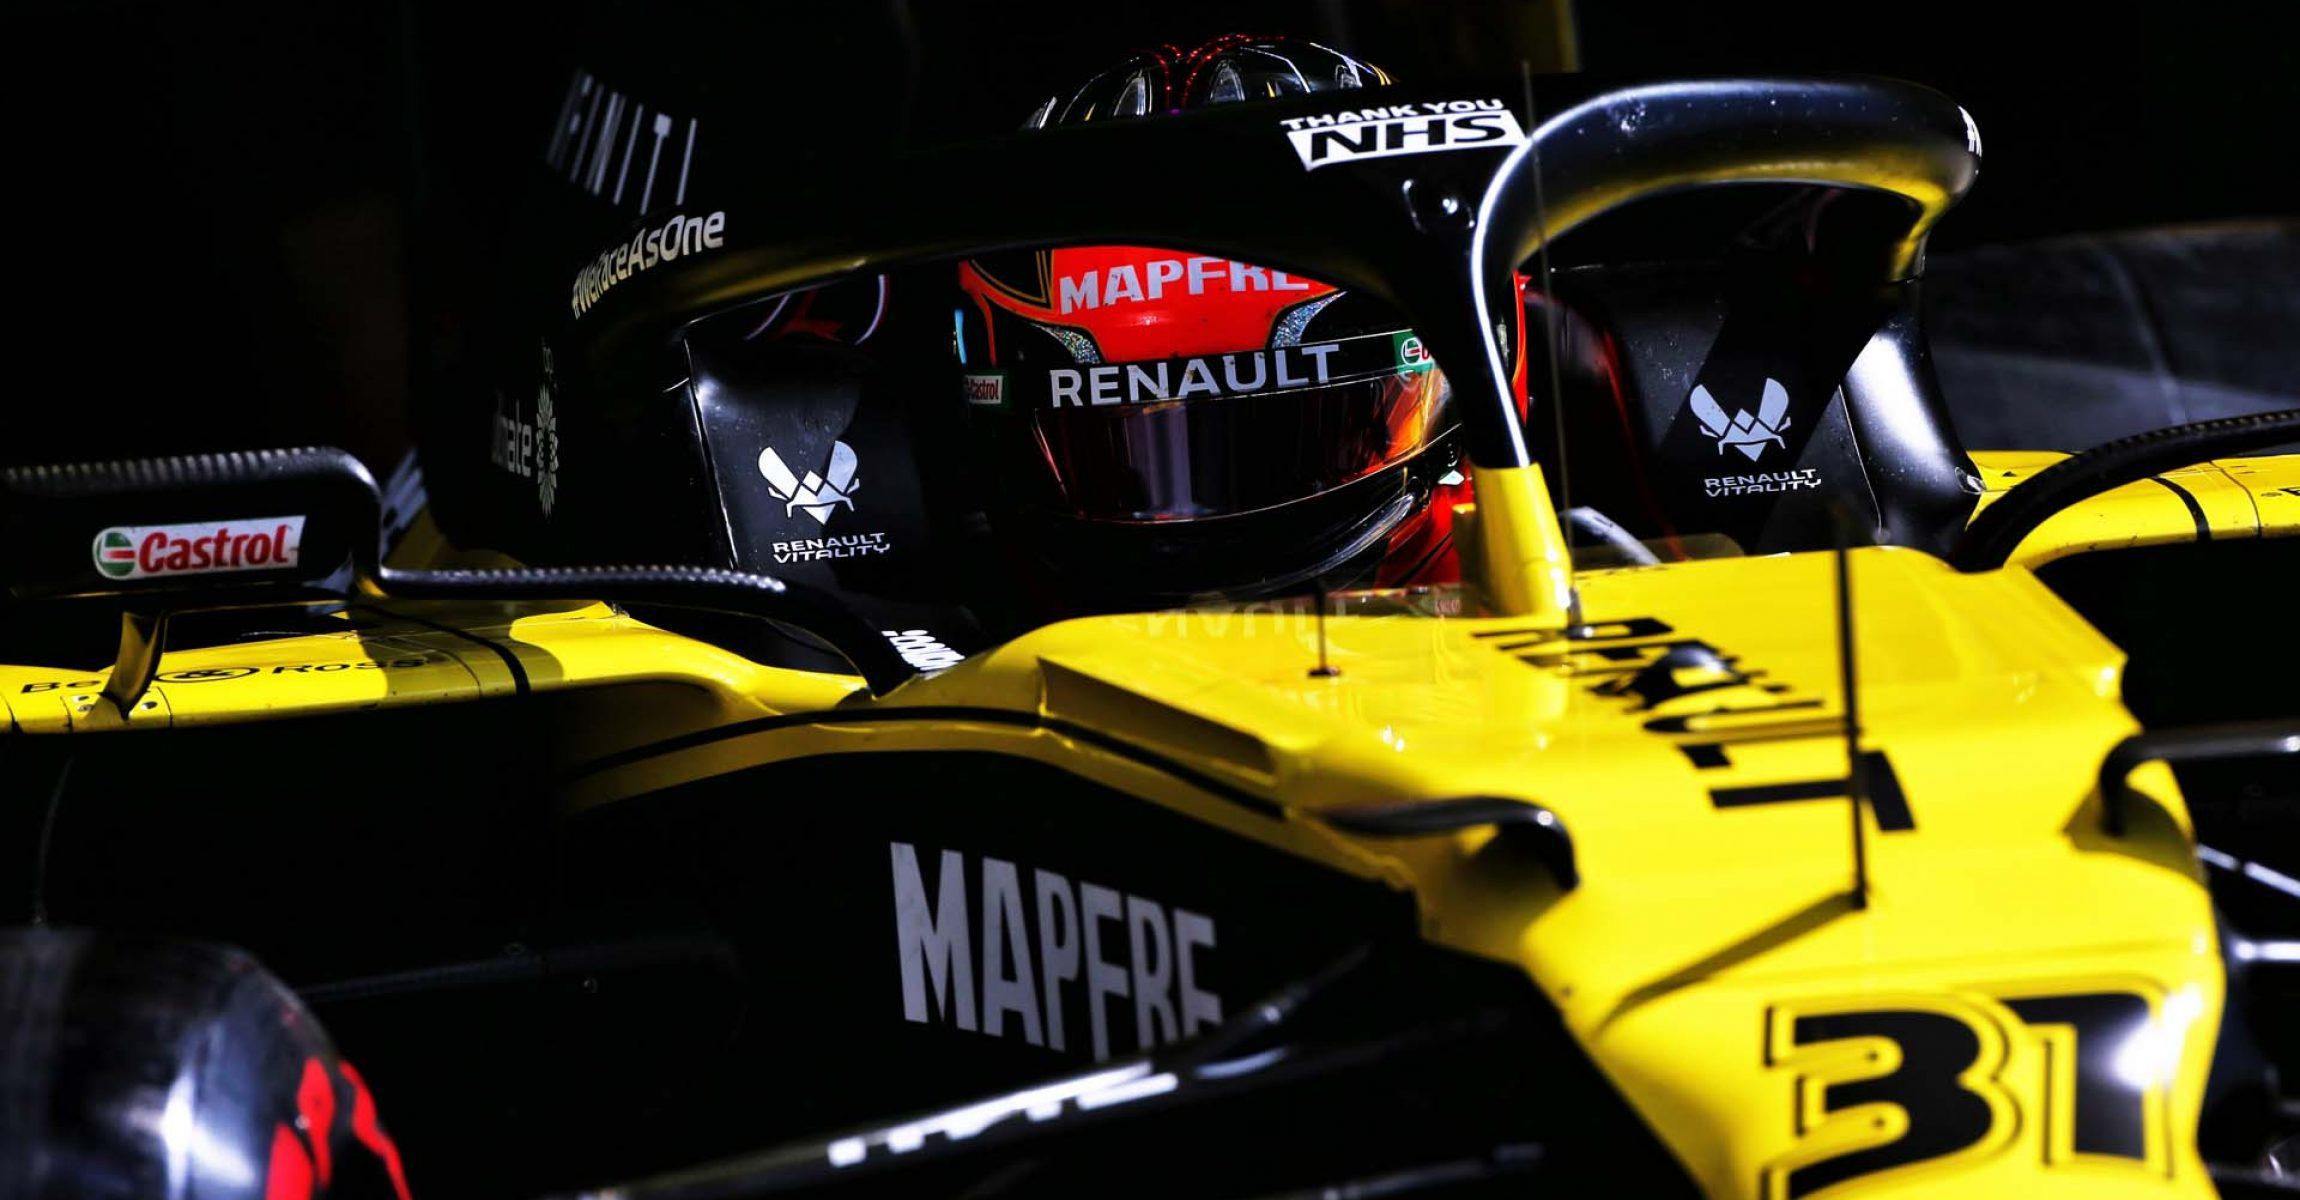 Esteban Ocon (FRA) Renault F1 Team RS20. British Grand Prix, Saturday 1st August 2020. Silverstone, England.